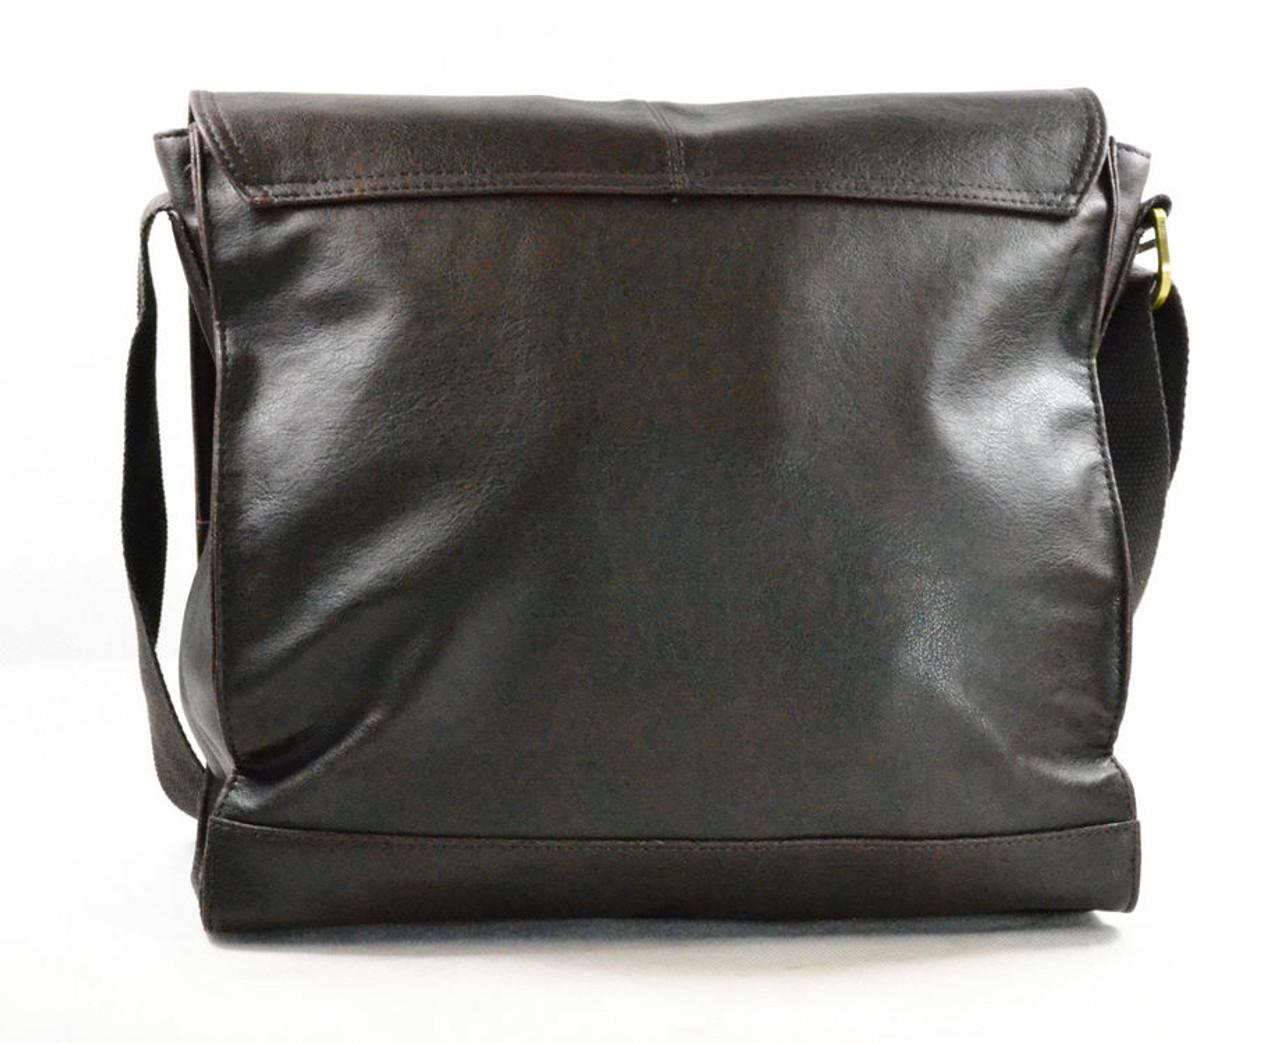 9755bdabdeb0 Storm Abbey Brown Faux-Leather Despatch Messenger Bag